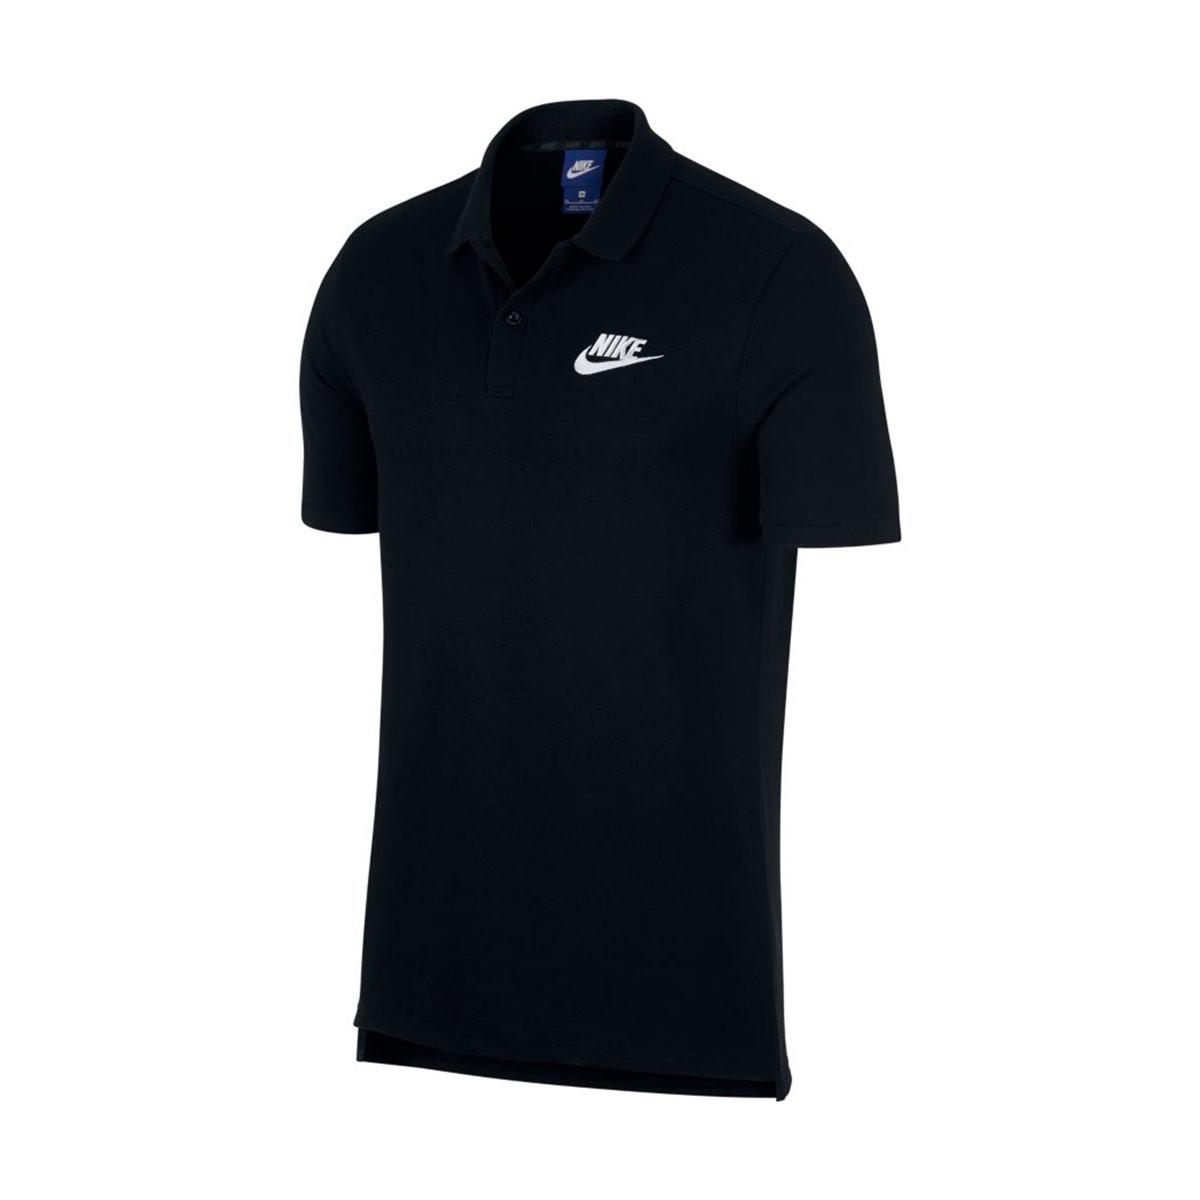 82be1d5d Polo shirt Nike Sportswear Black-White - Football store Fútbol Emotion